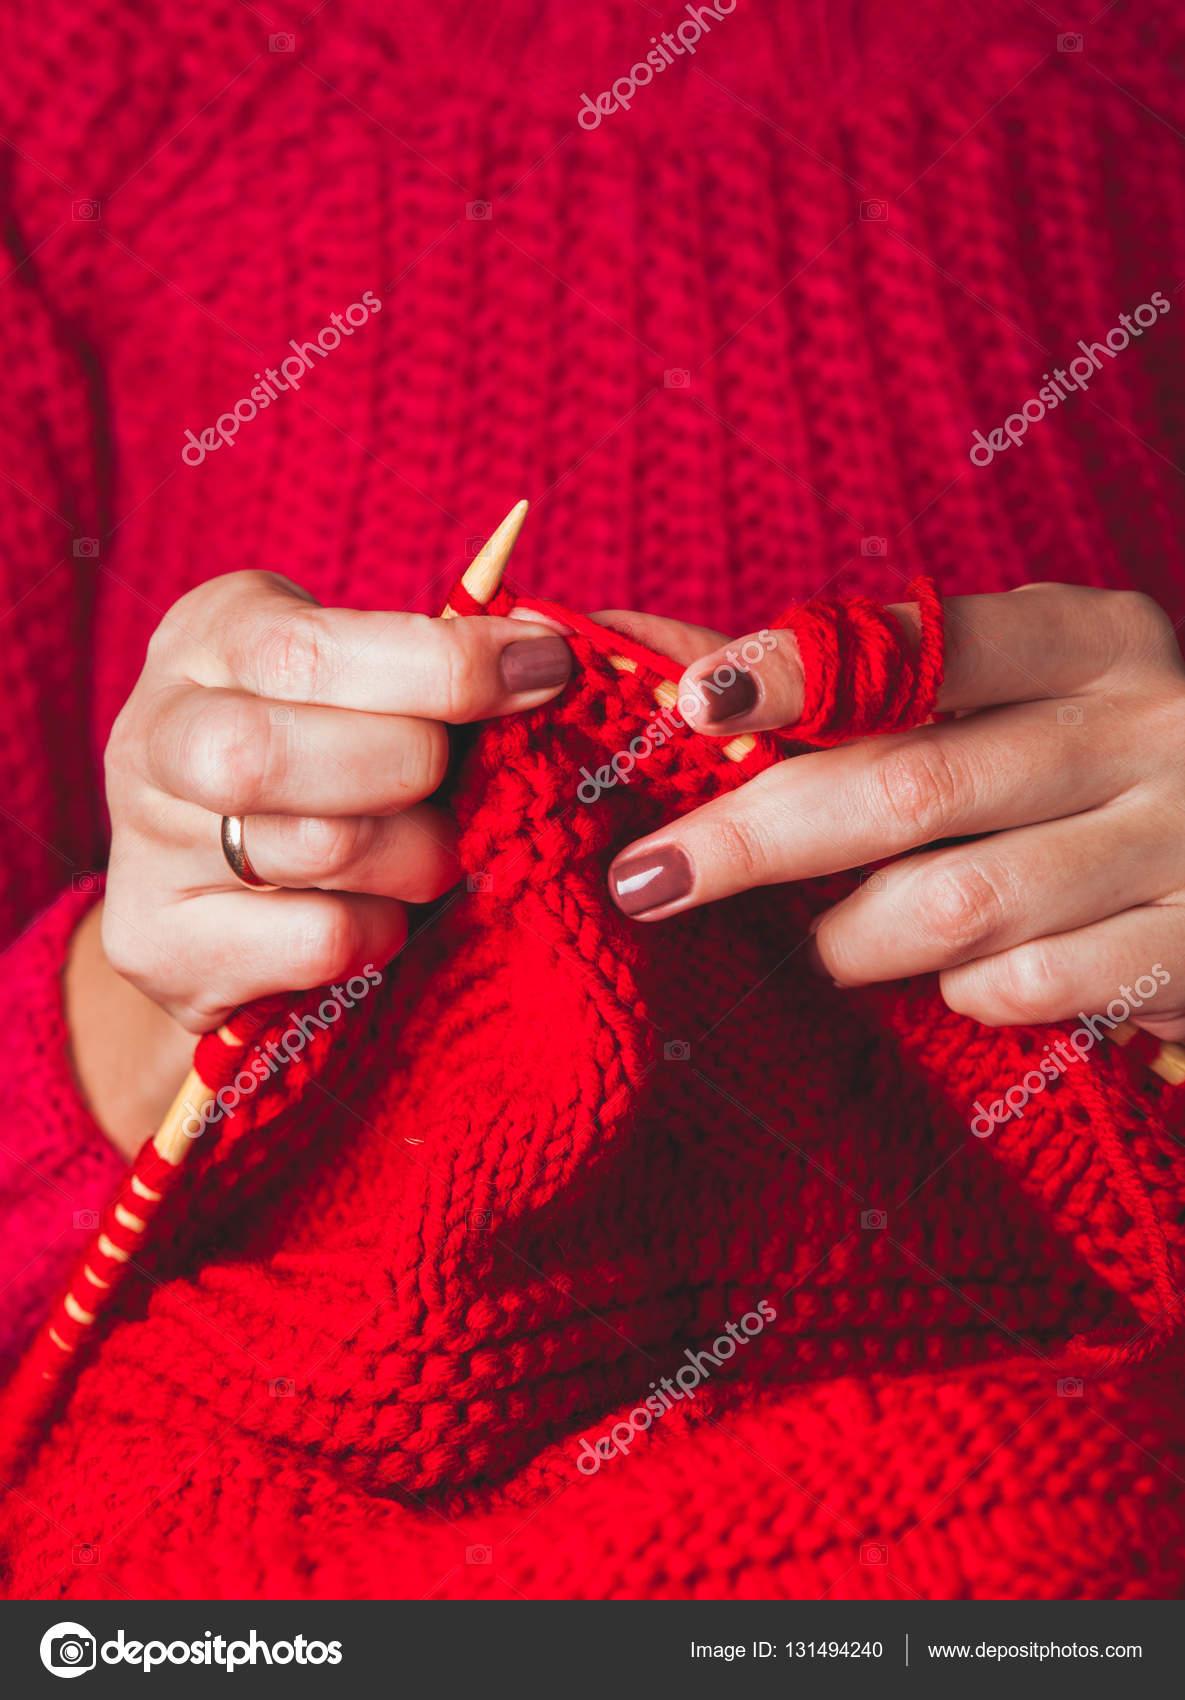 809a0bb0e286 Χέρια Γυναικεία πλεκτά πουλόβερ — Φωτογραφία Αρχείου © oksixx  131494240